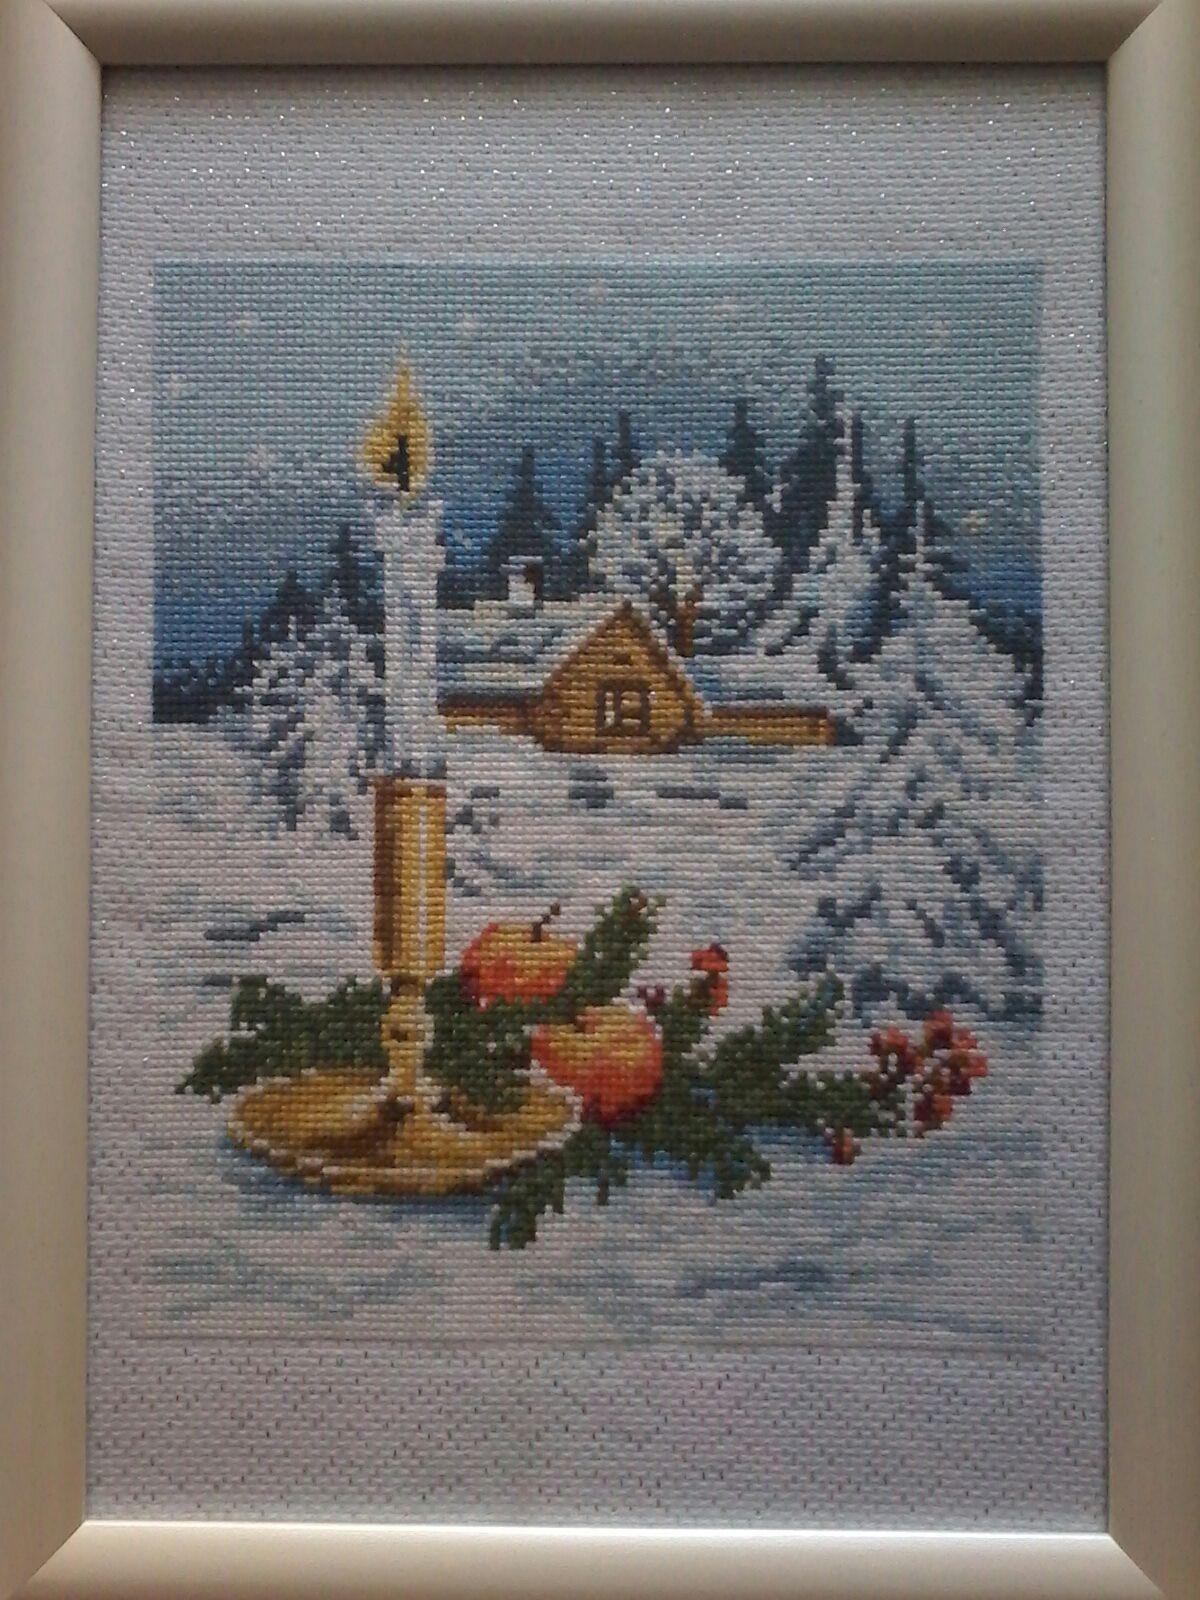 снег свеча рождество домики зима